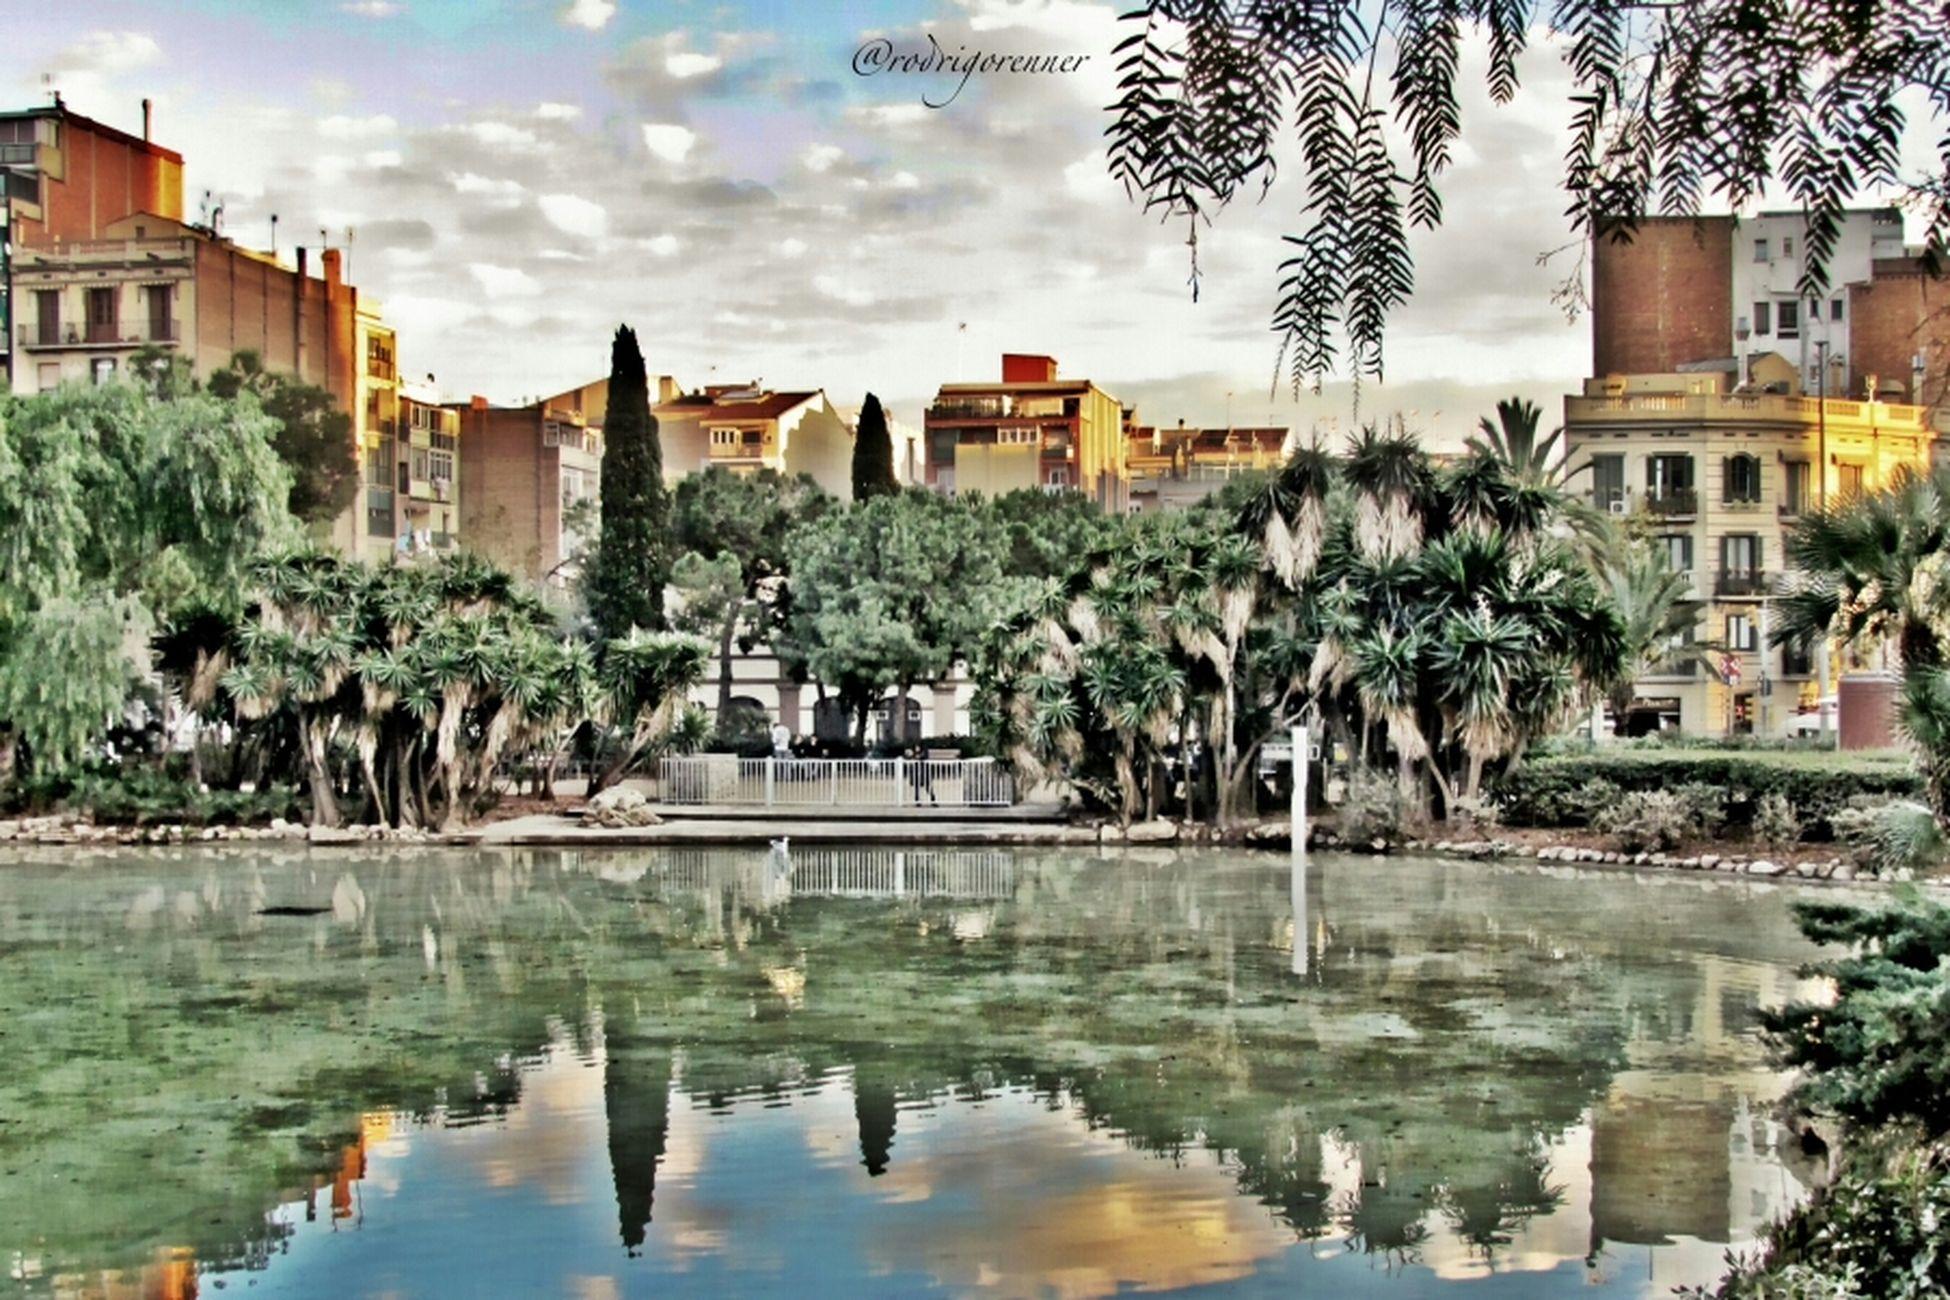 Barcelona/Spain My App Is Working Now! \o/